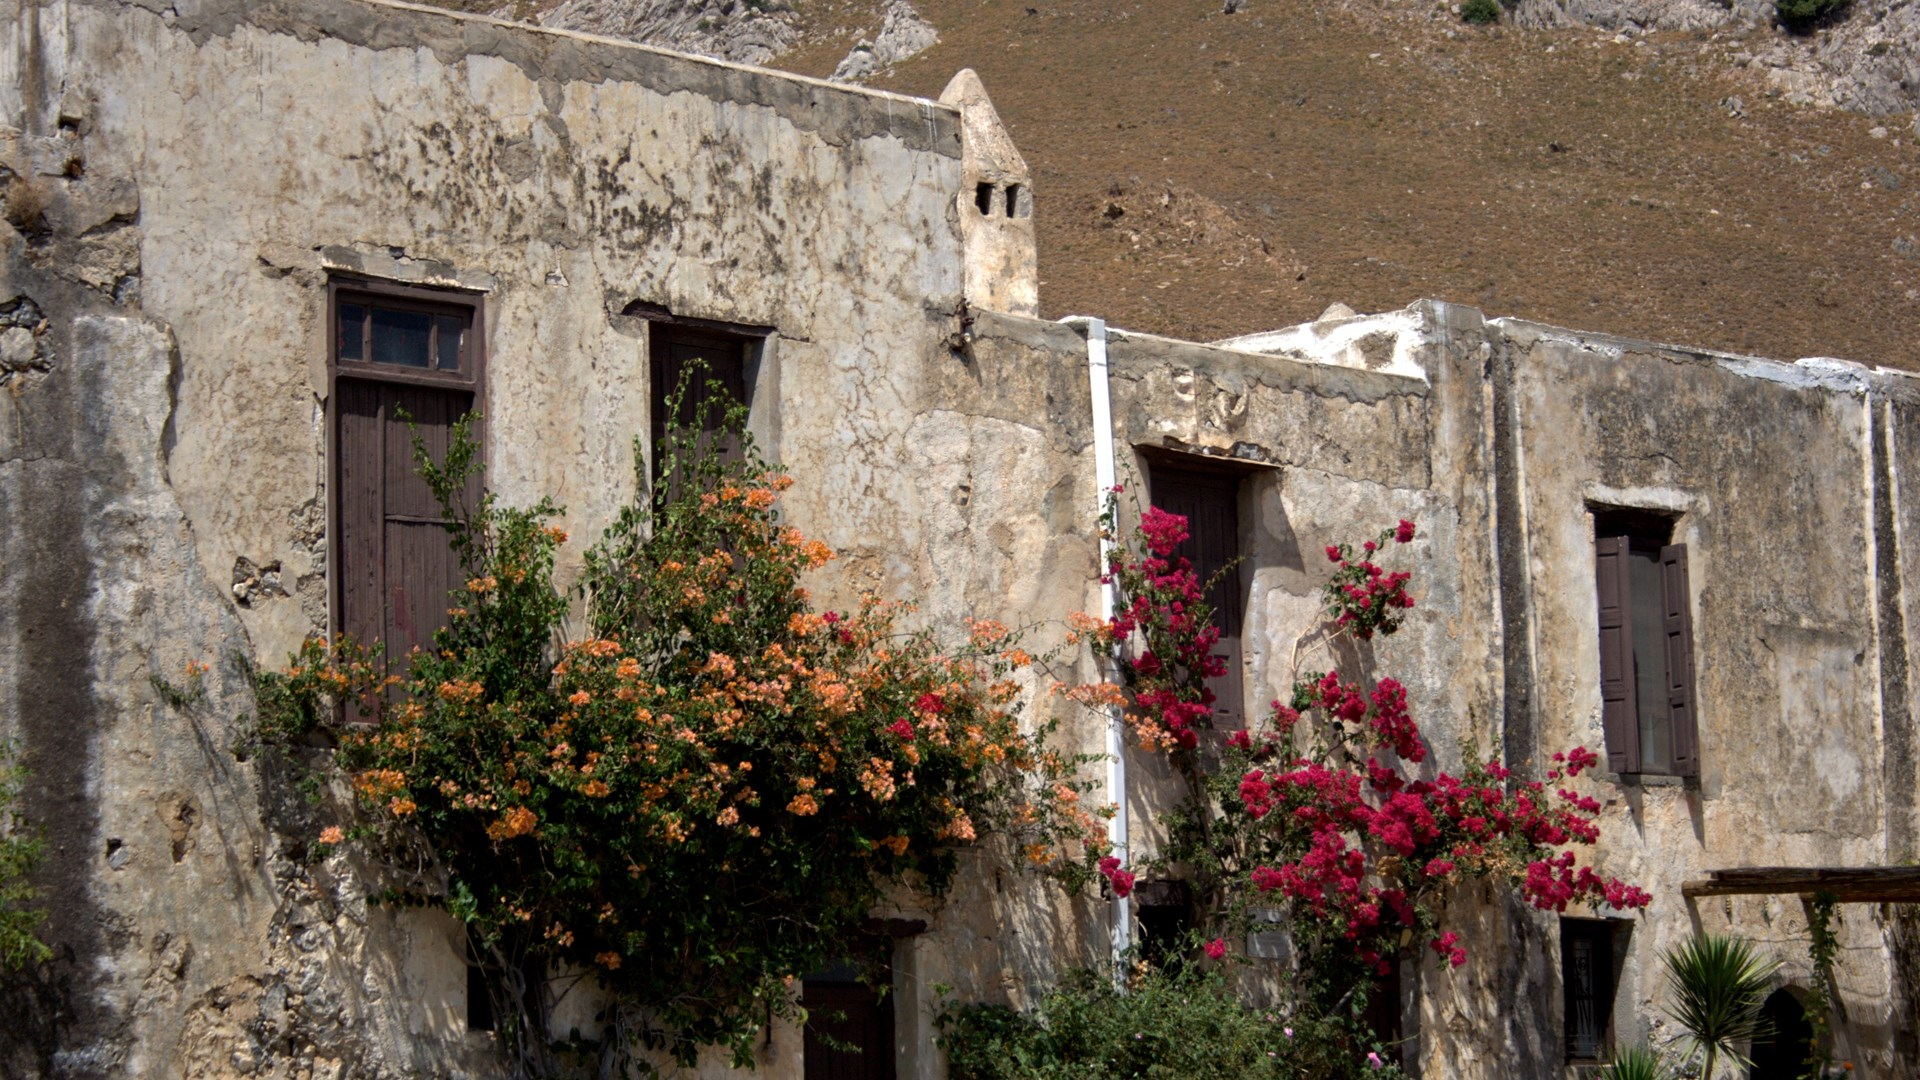 Preveli Monastery, Rethymno – Crete | 04 Oct 2014  | Alargo